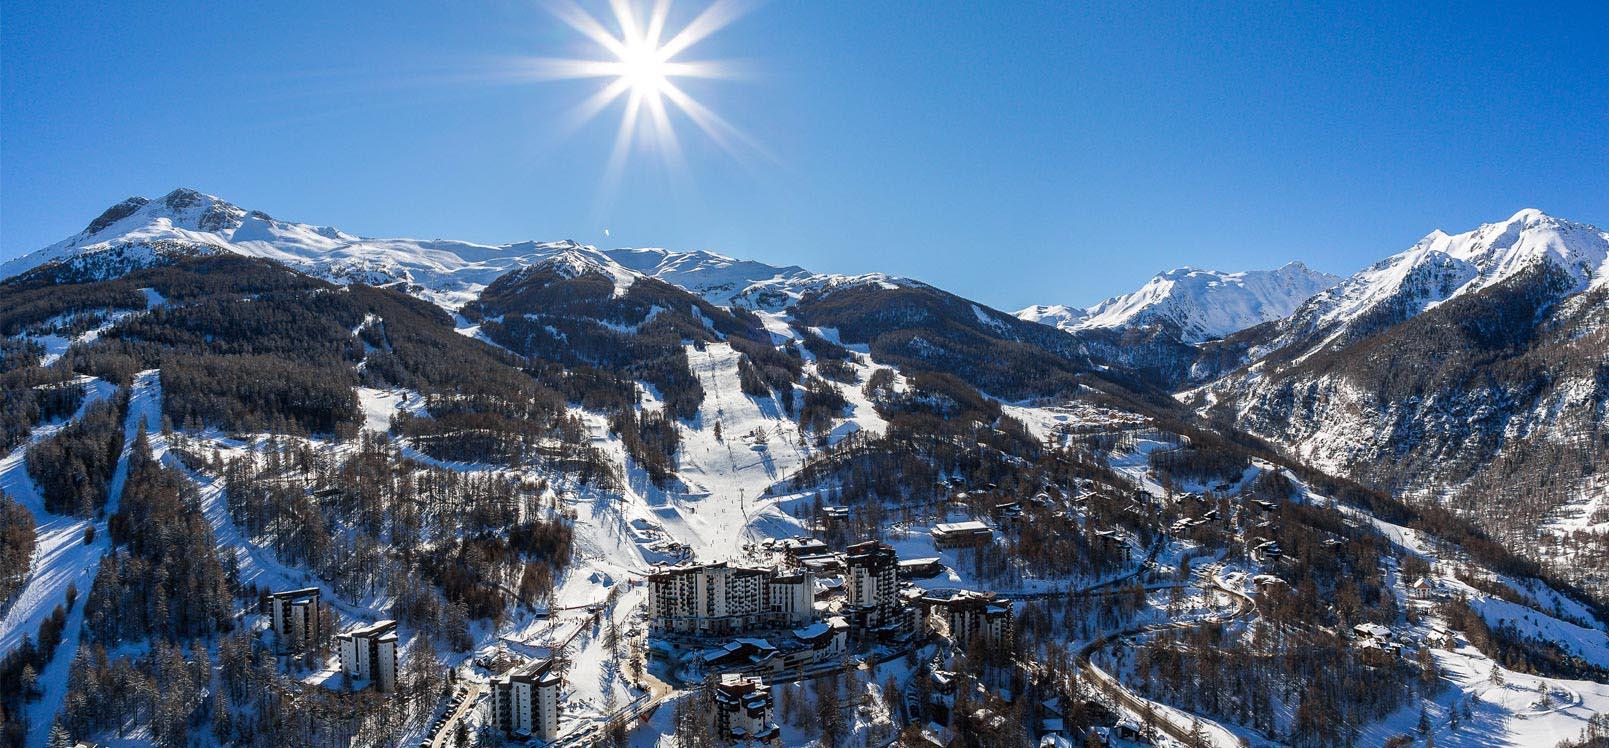 Canada Lyrica generic >> Buy real lyrica, Les Orres: Hautes-Alpes